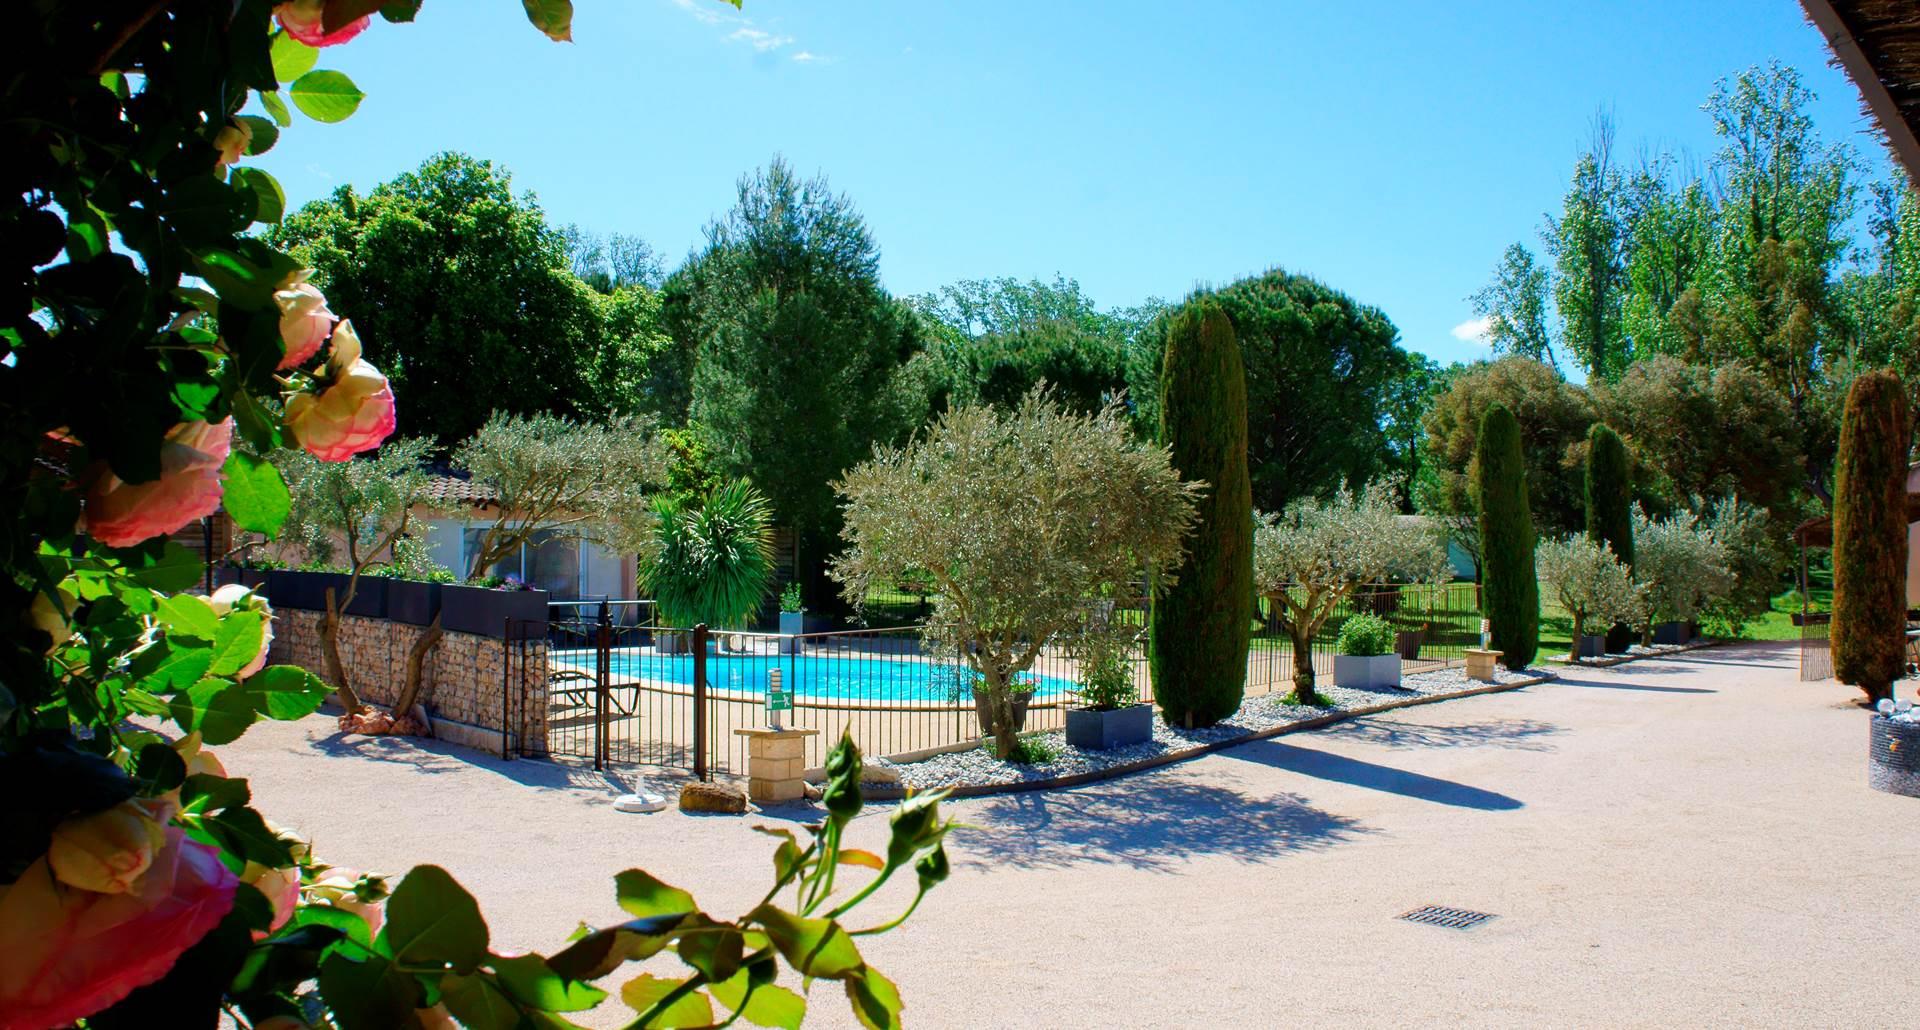 Piscine vacances hotel residence les peupliers loriol du comtat provence